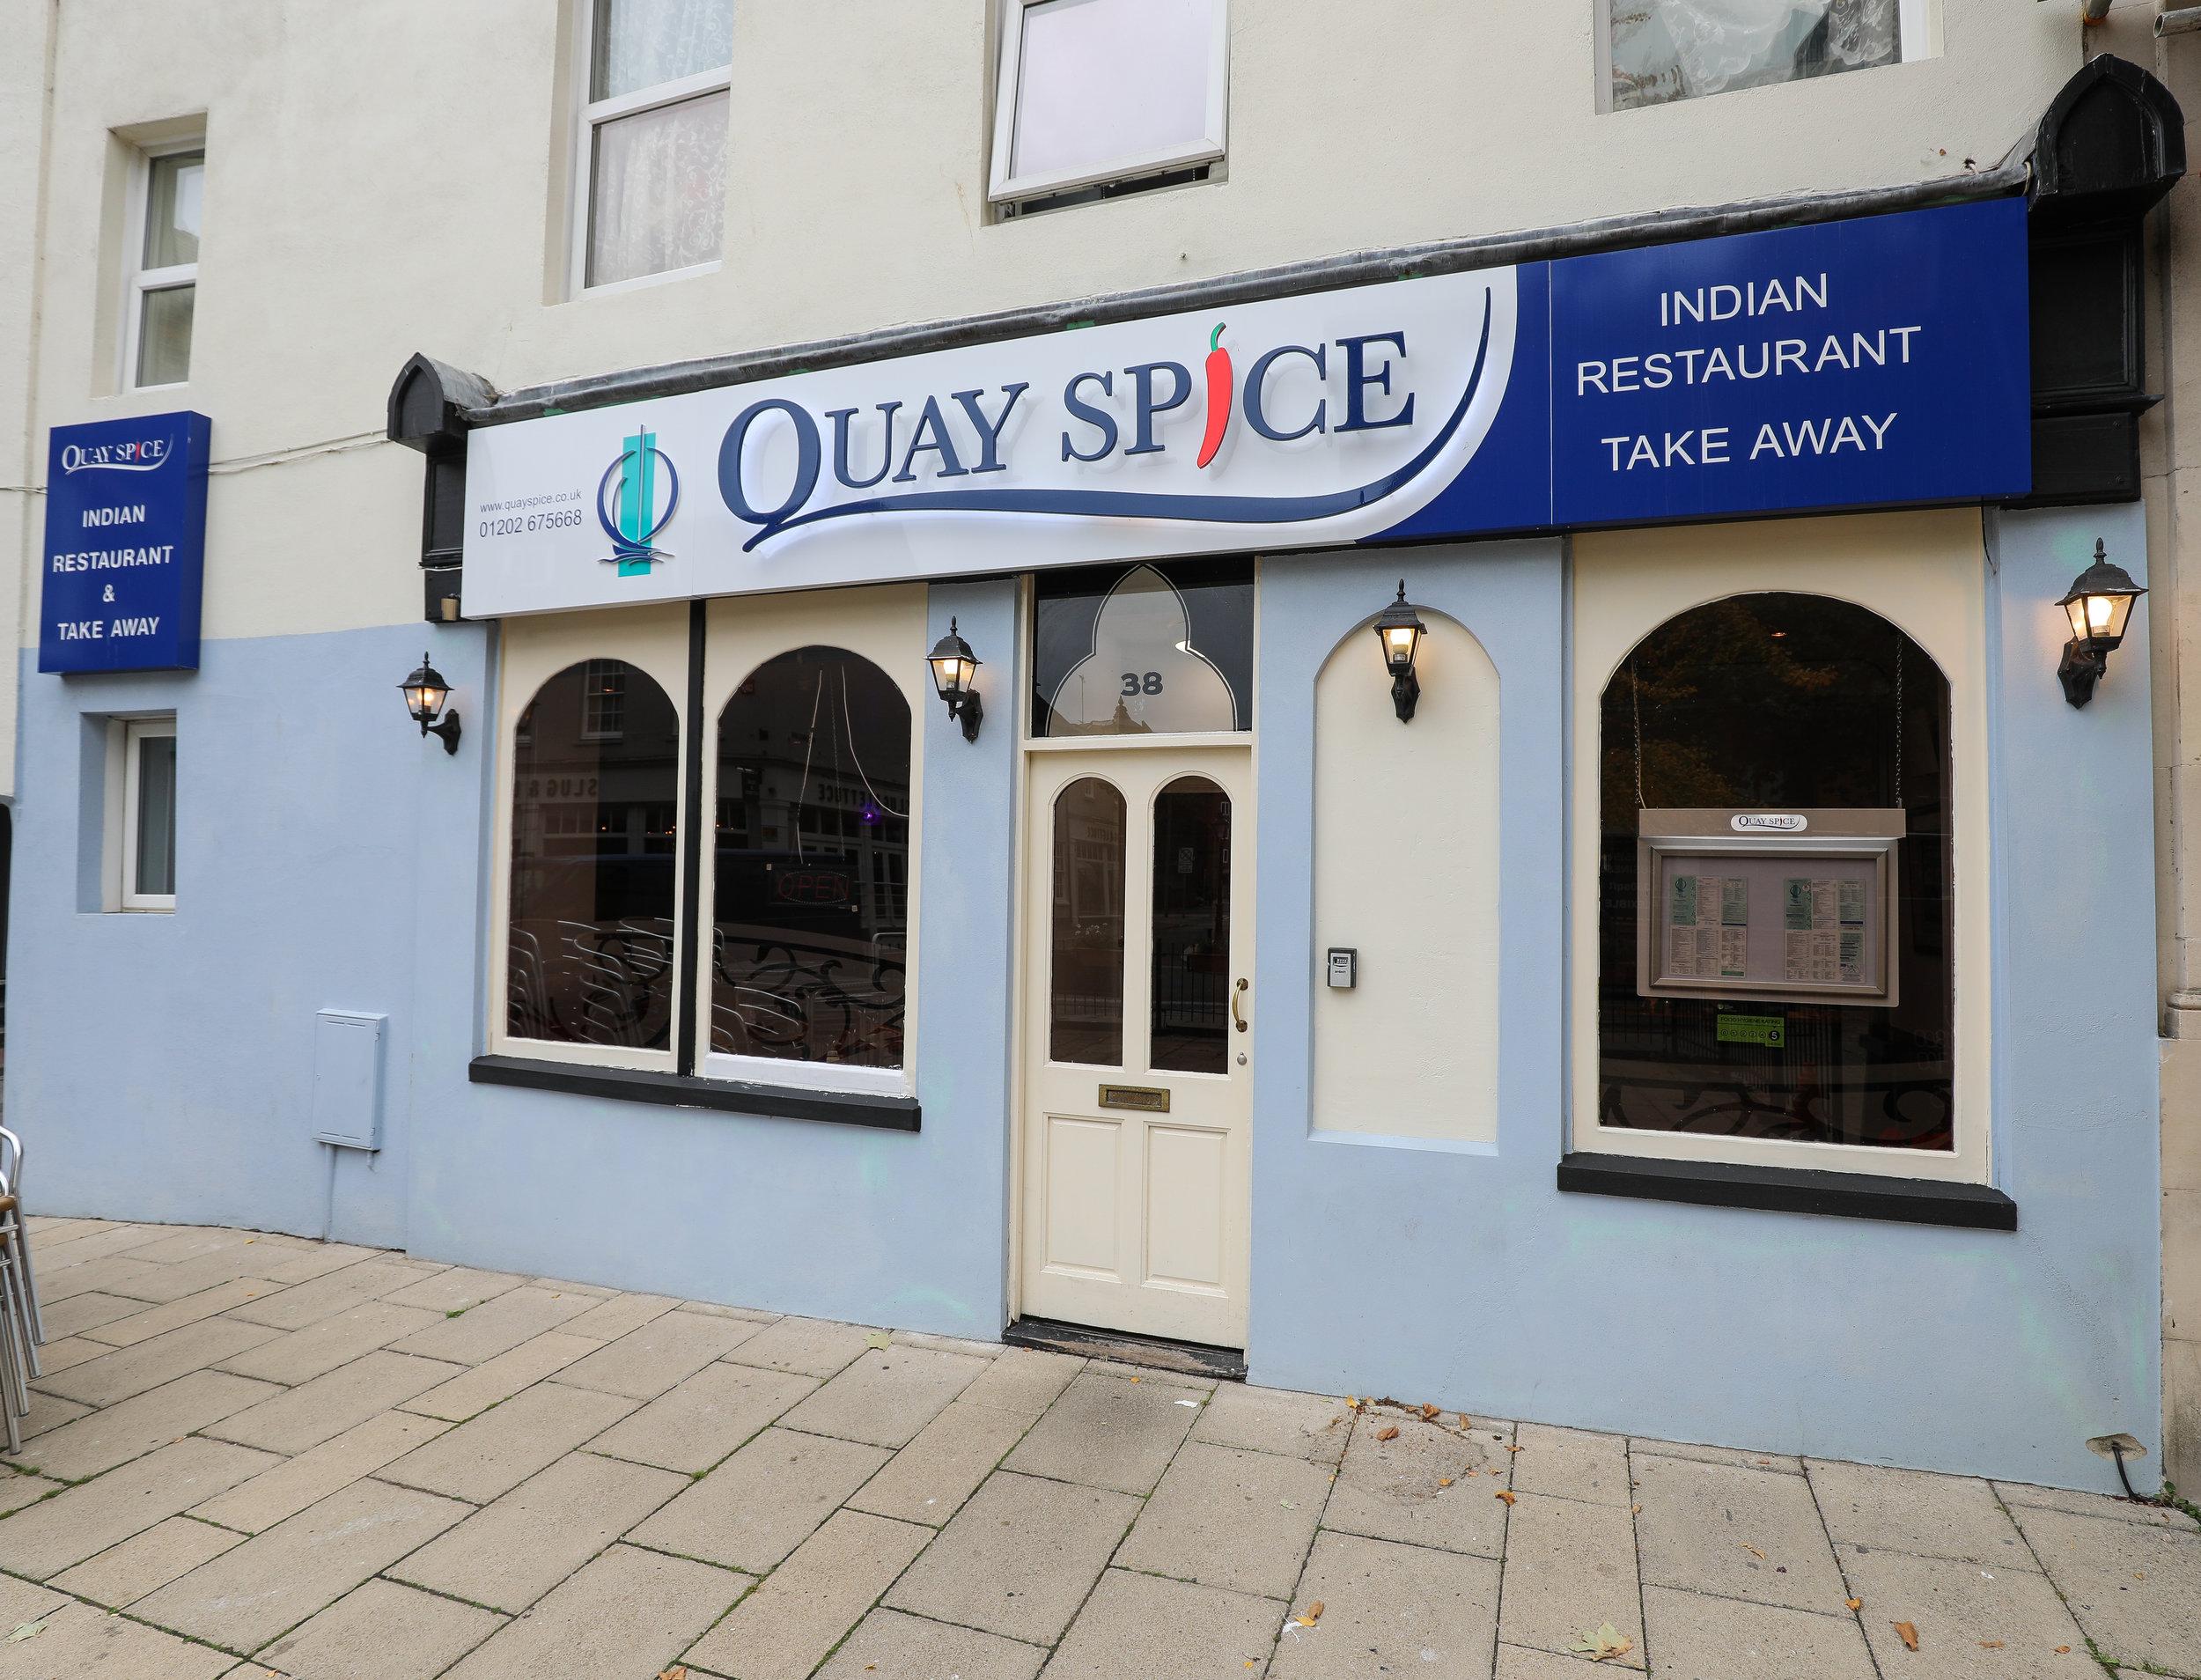 W Tandoori Quay Spice-101.jpg